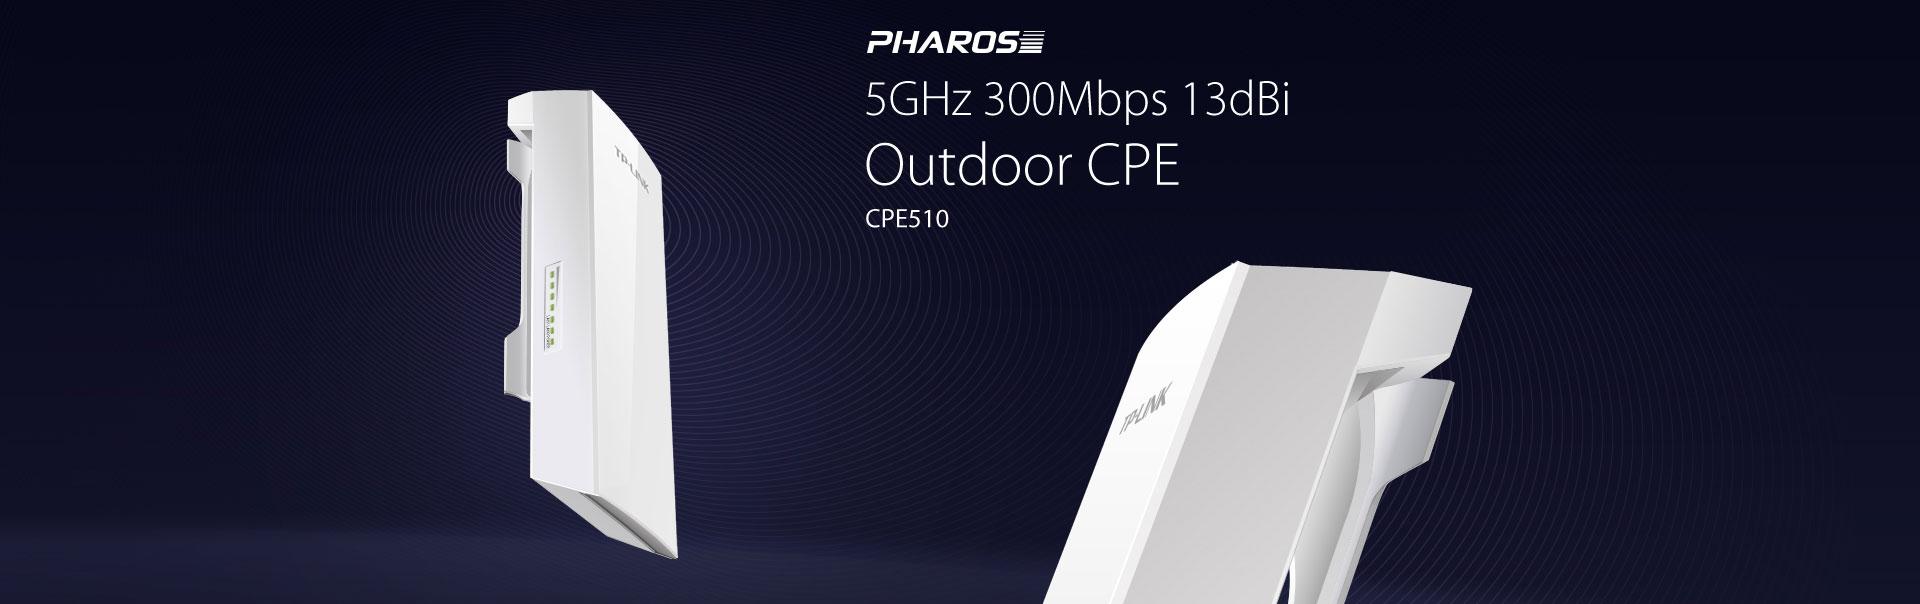 Pharos 5GHz 300Mbps 9dBi Outdoor CPE